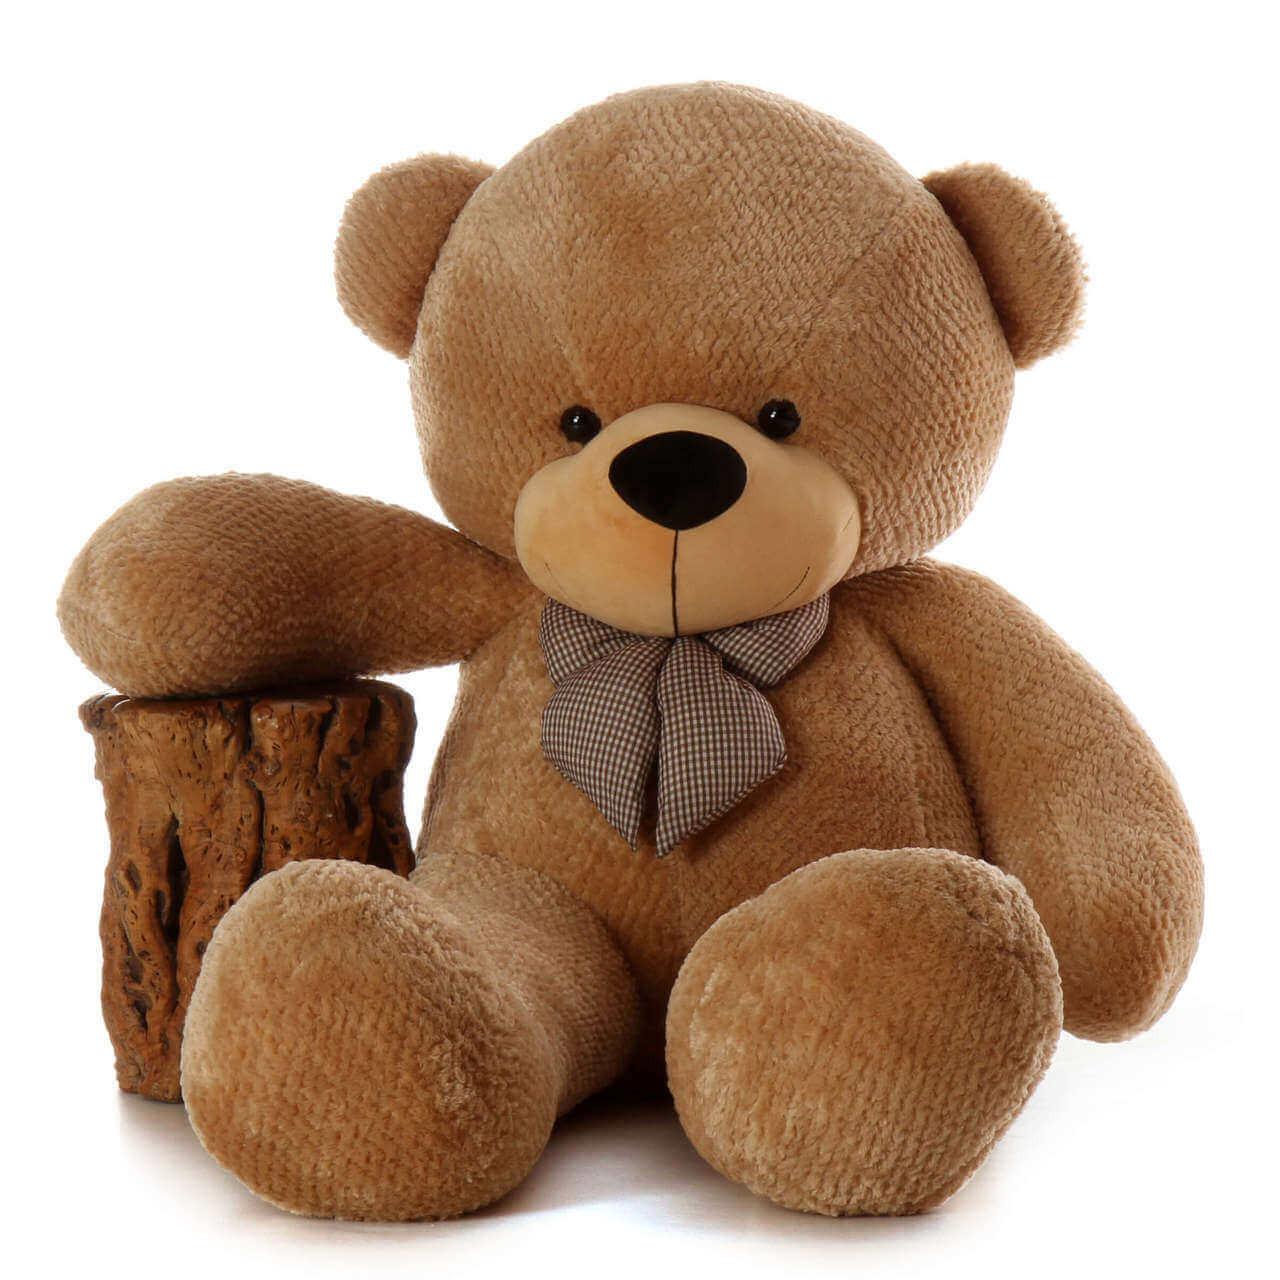 6ft Life Size Teddy Bear Shaggy Cuddles soft amber brown fur